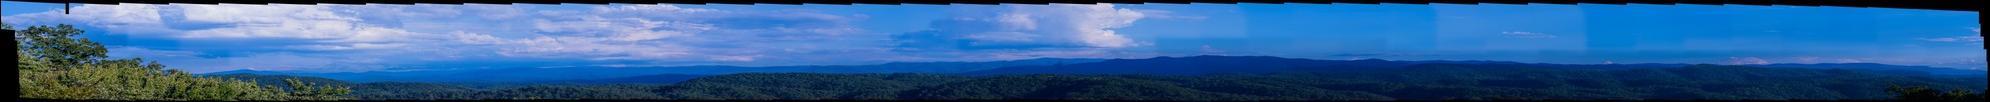 Smokey Mountains - Foothills Parkway